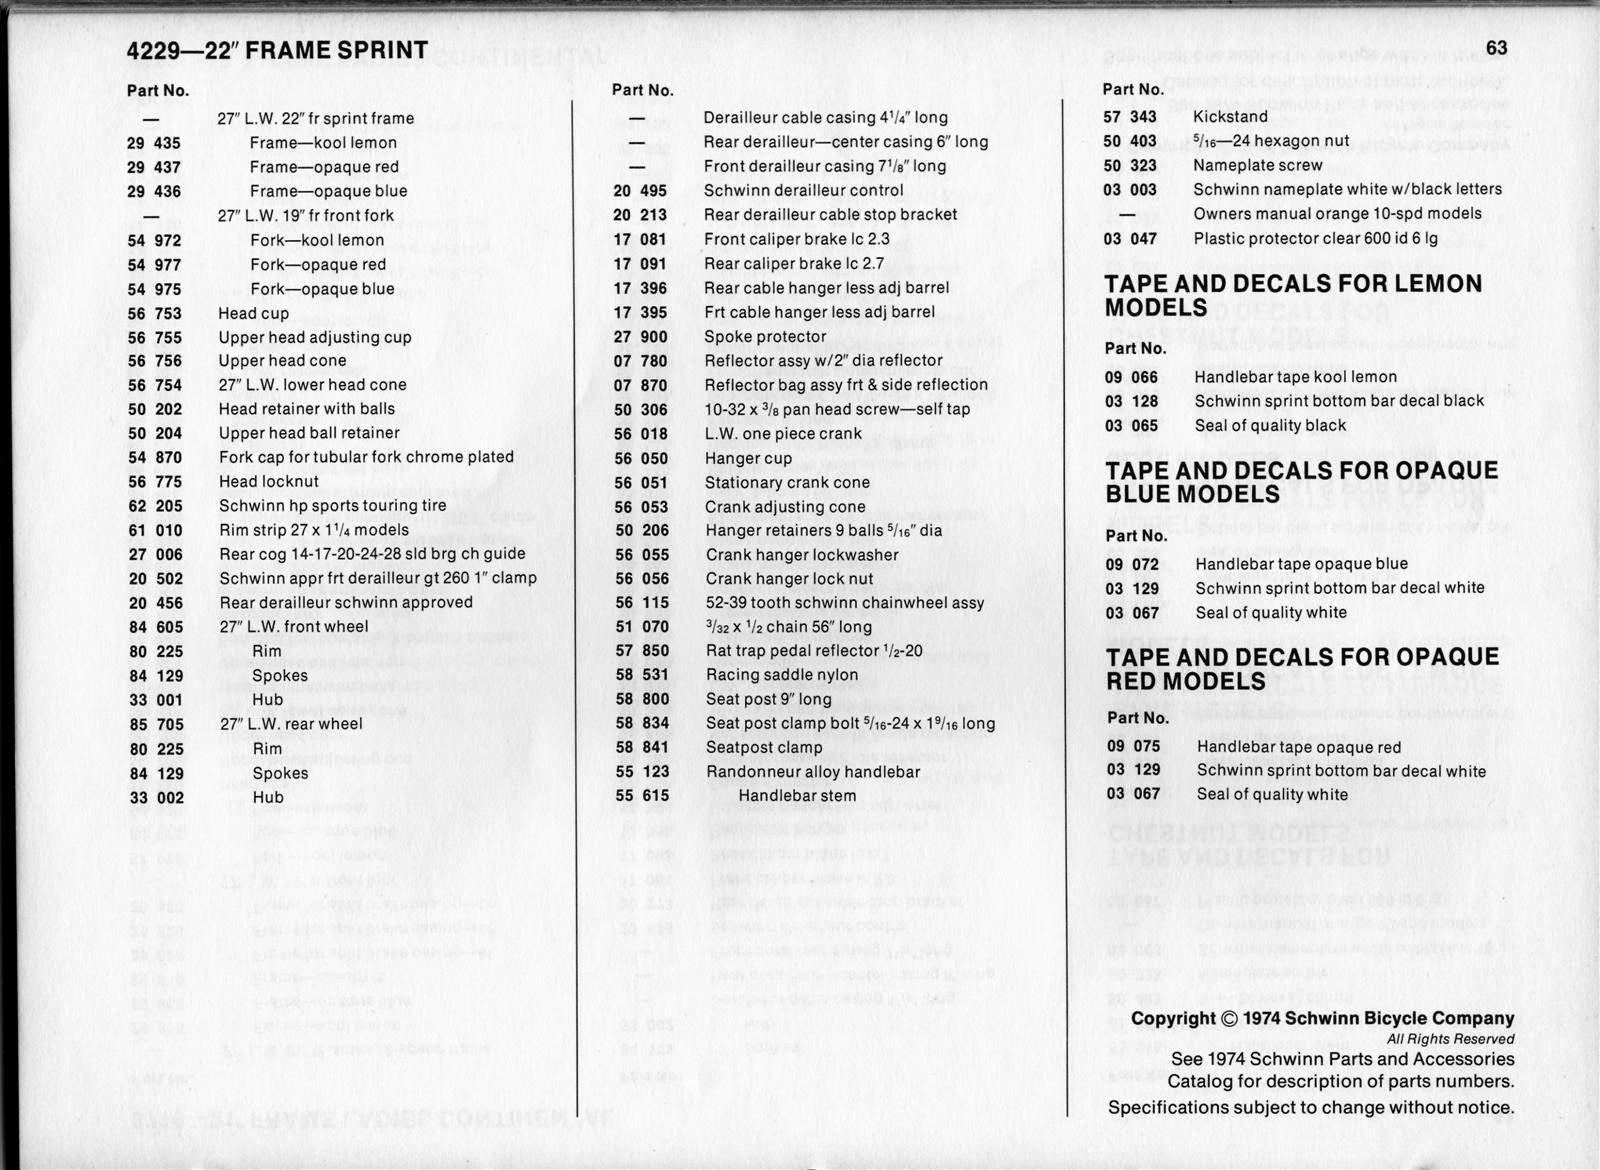 SLDB 1974 Dealers Catalog